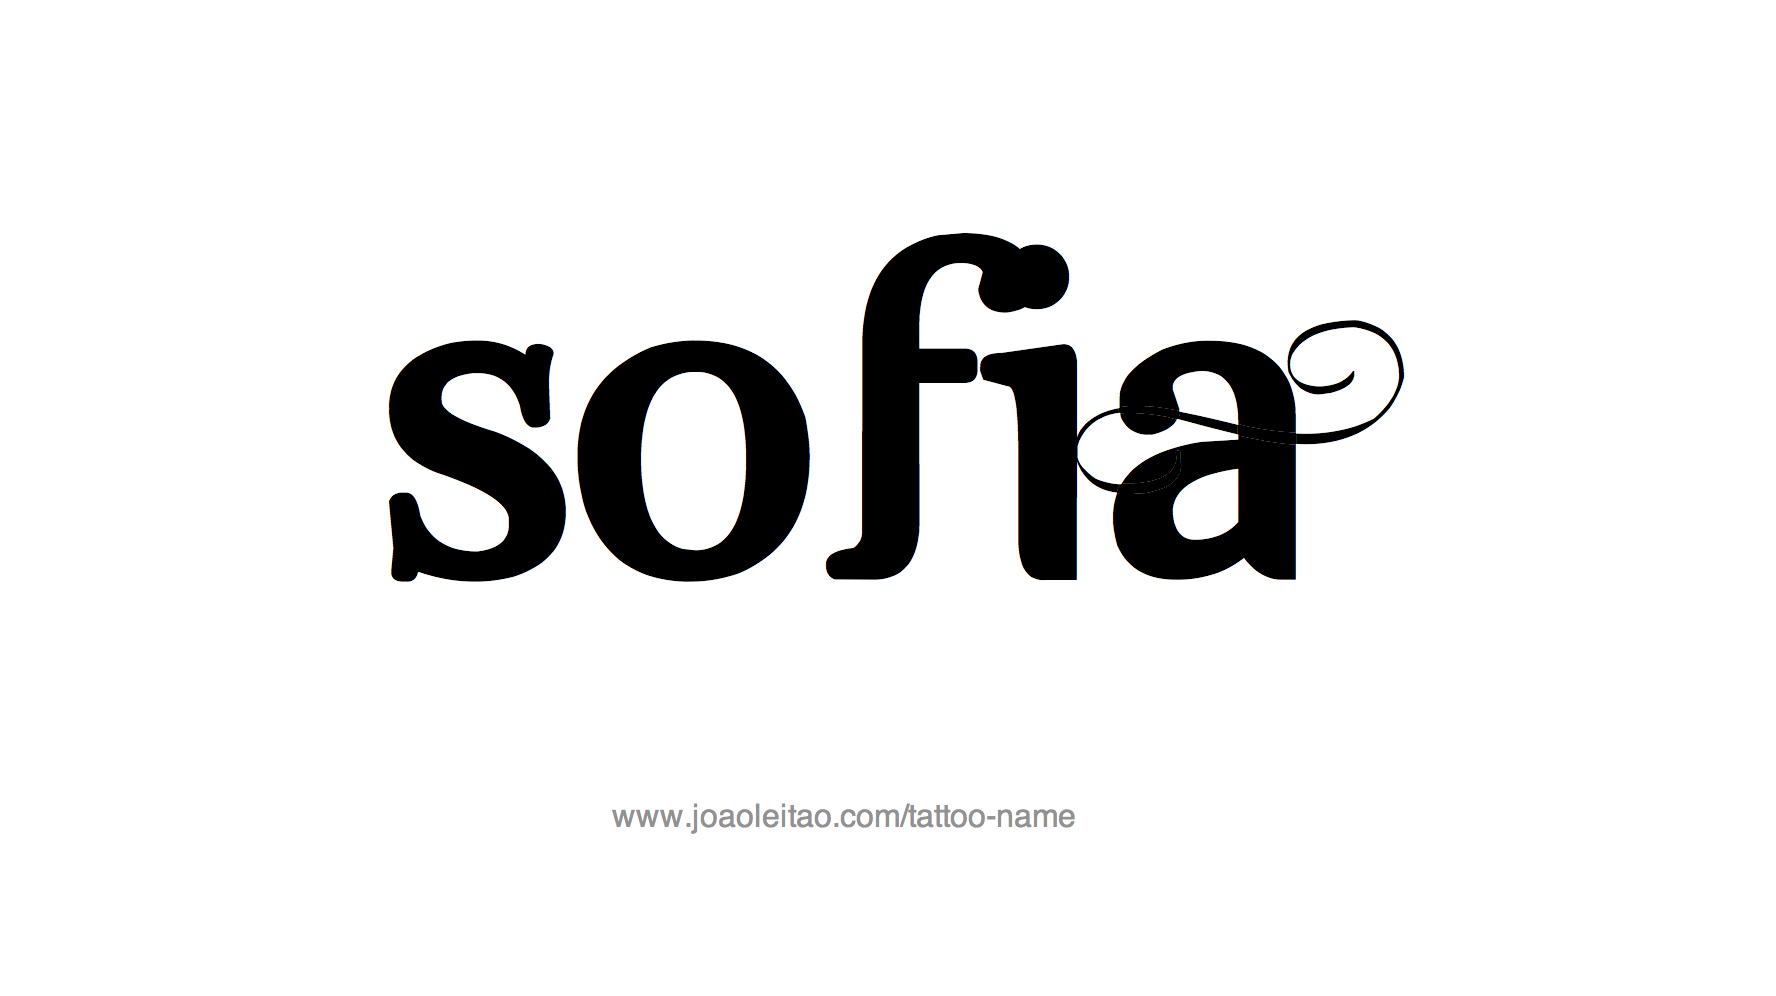 tattoo design female name sofia2017png : tattoo design female name sofia2017 from www.joaoleitao.com size 1776 x 996 png 70kB